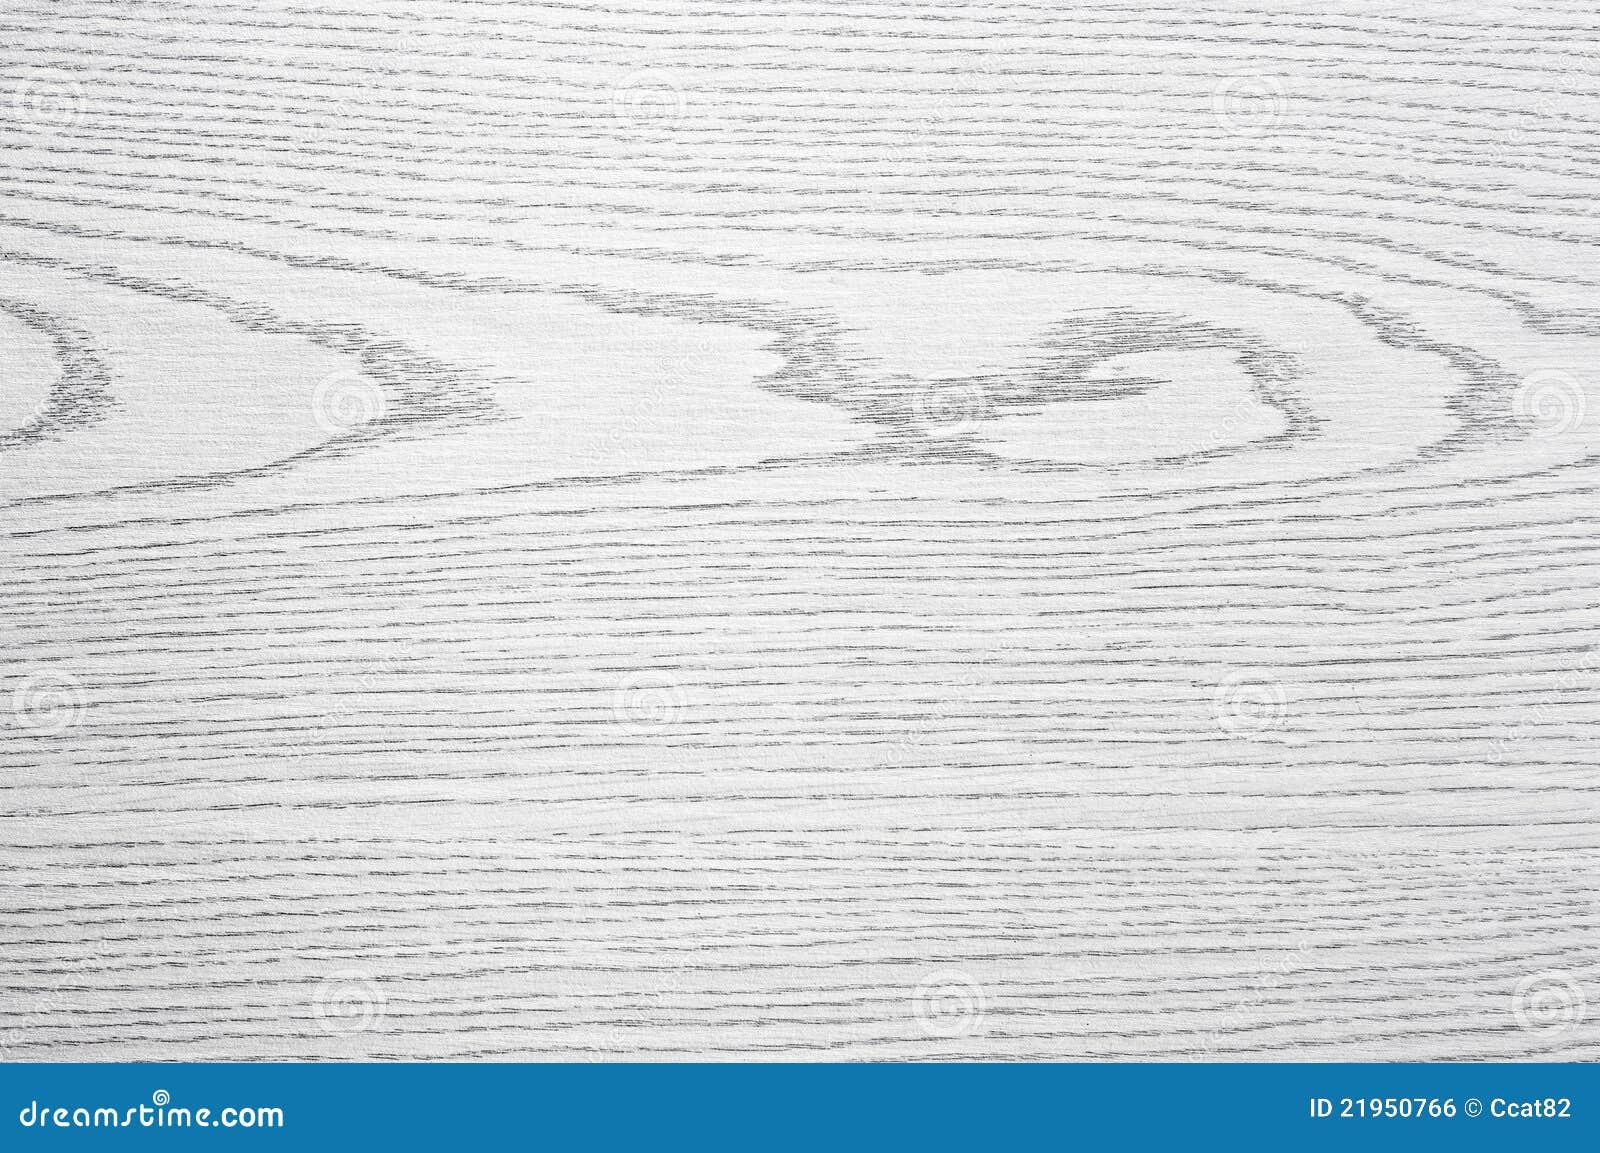 Texture Wood White Free : White Wood Texture Royalty Free Stock Image - Image: 21950766